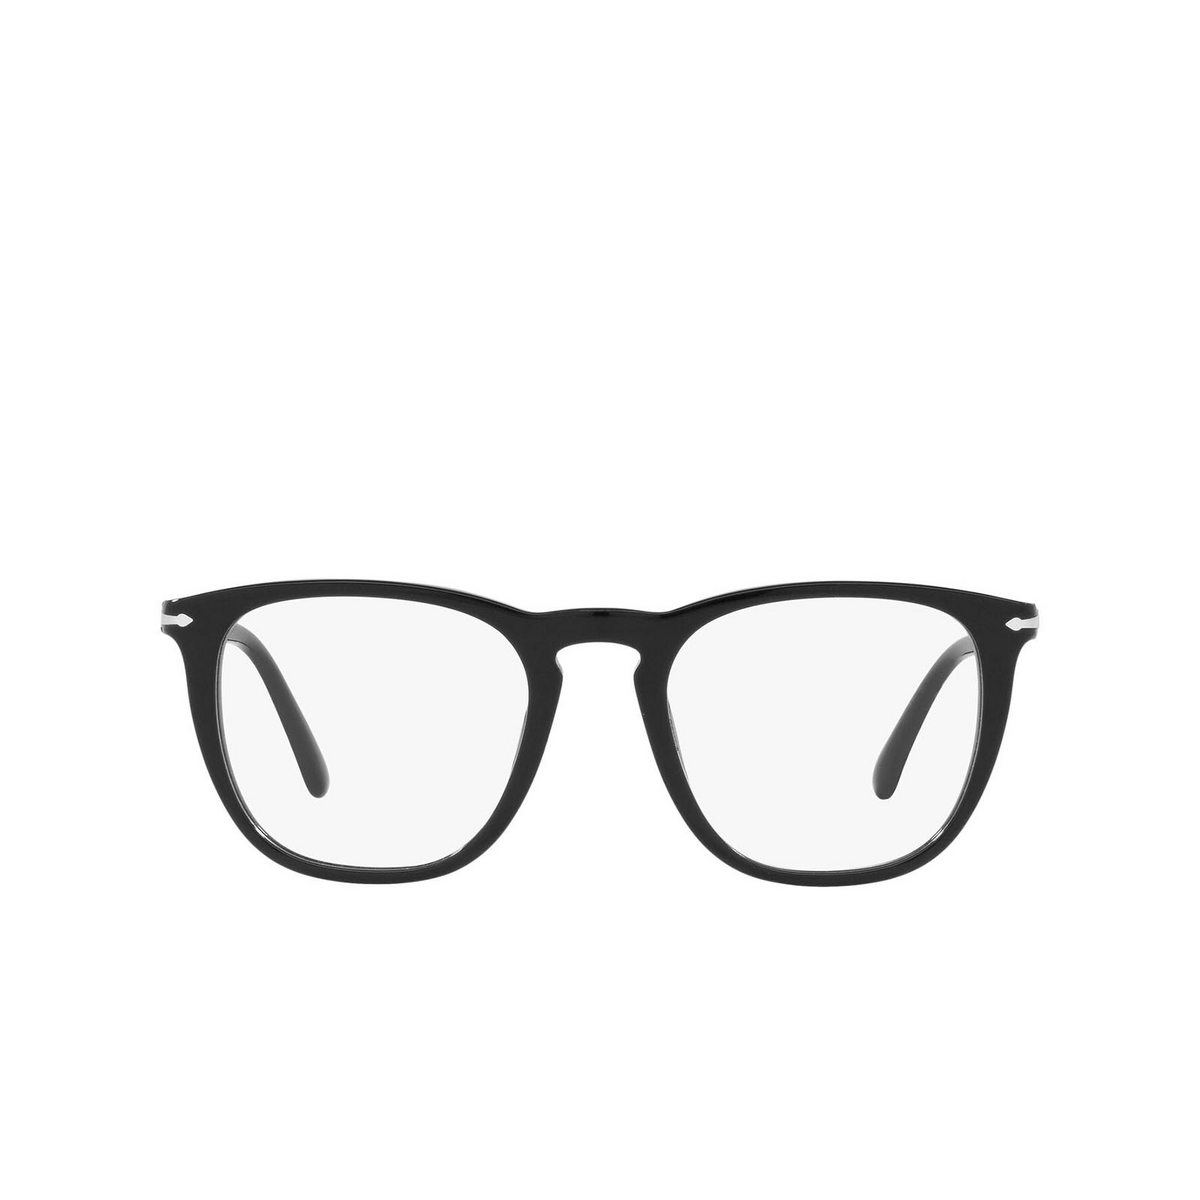 Persol® Square Eyeglasses: PO3266V color Black 95 - front view.